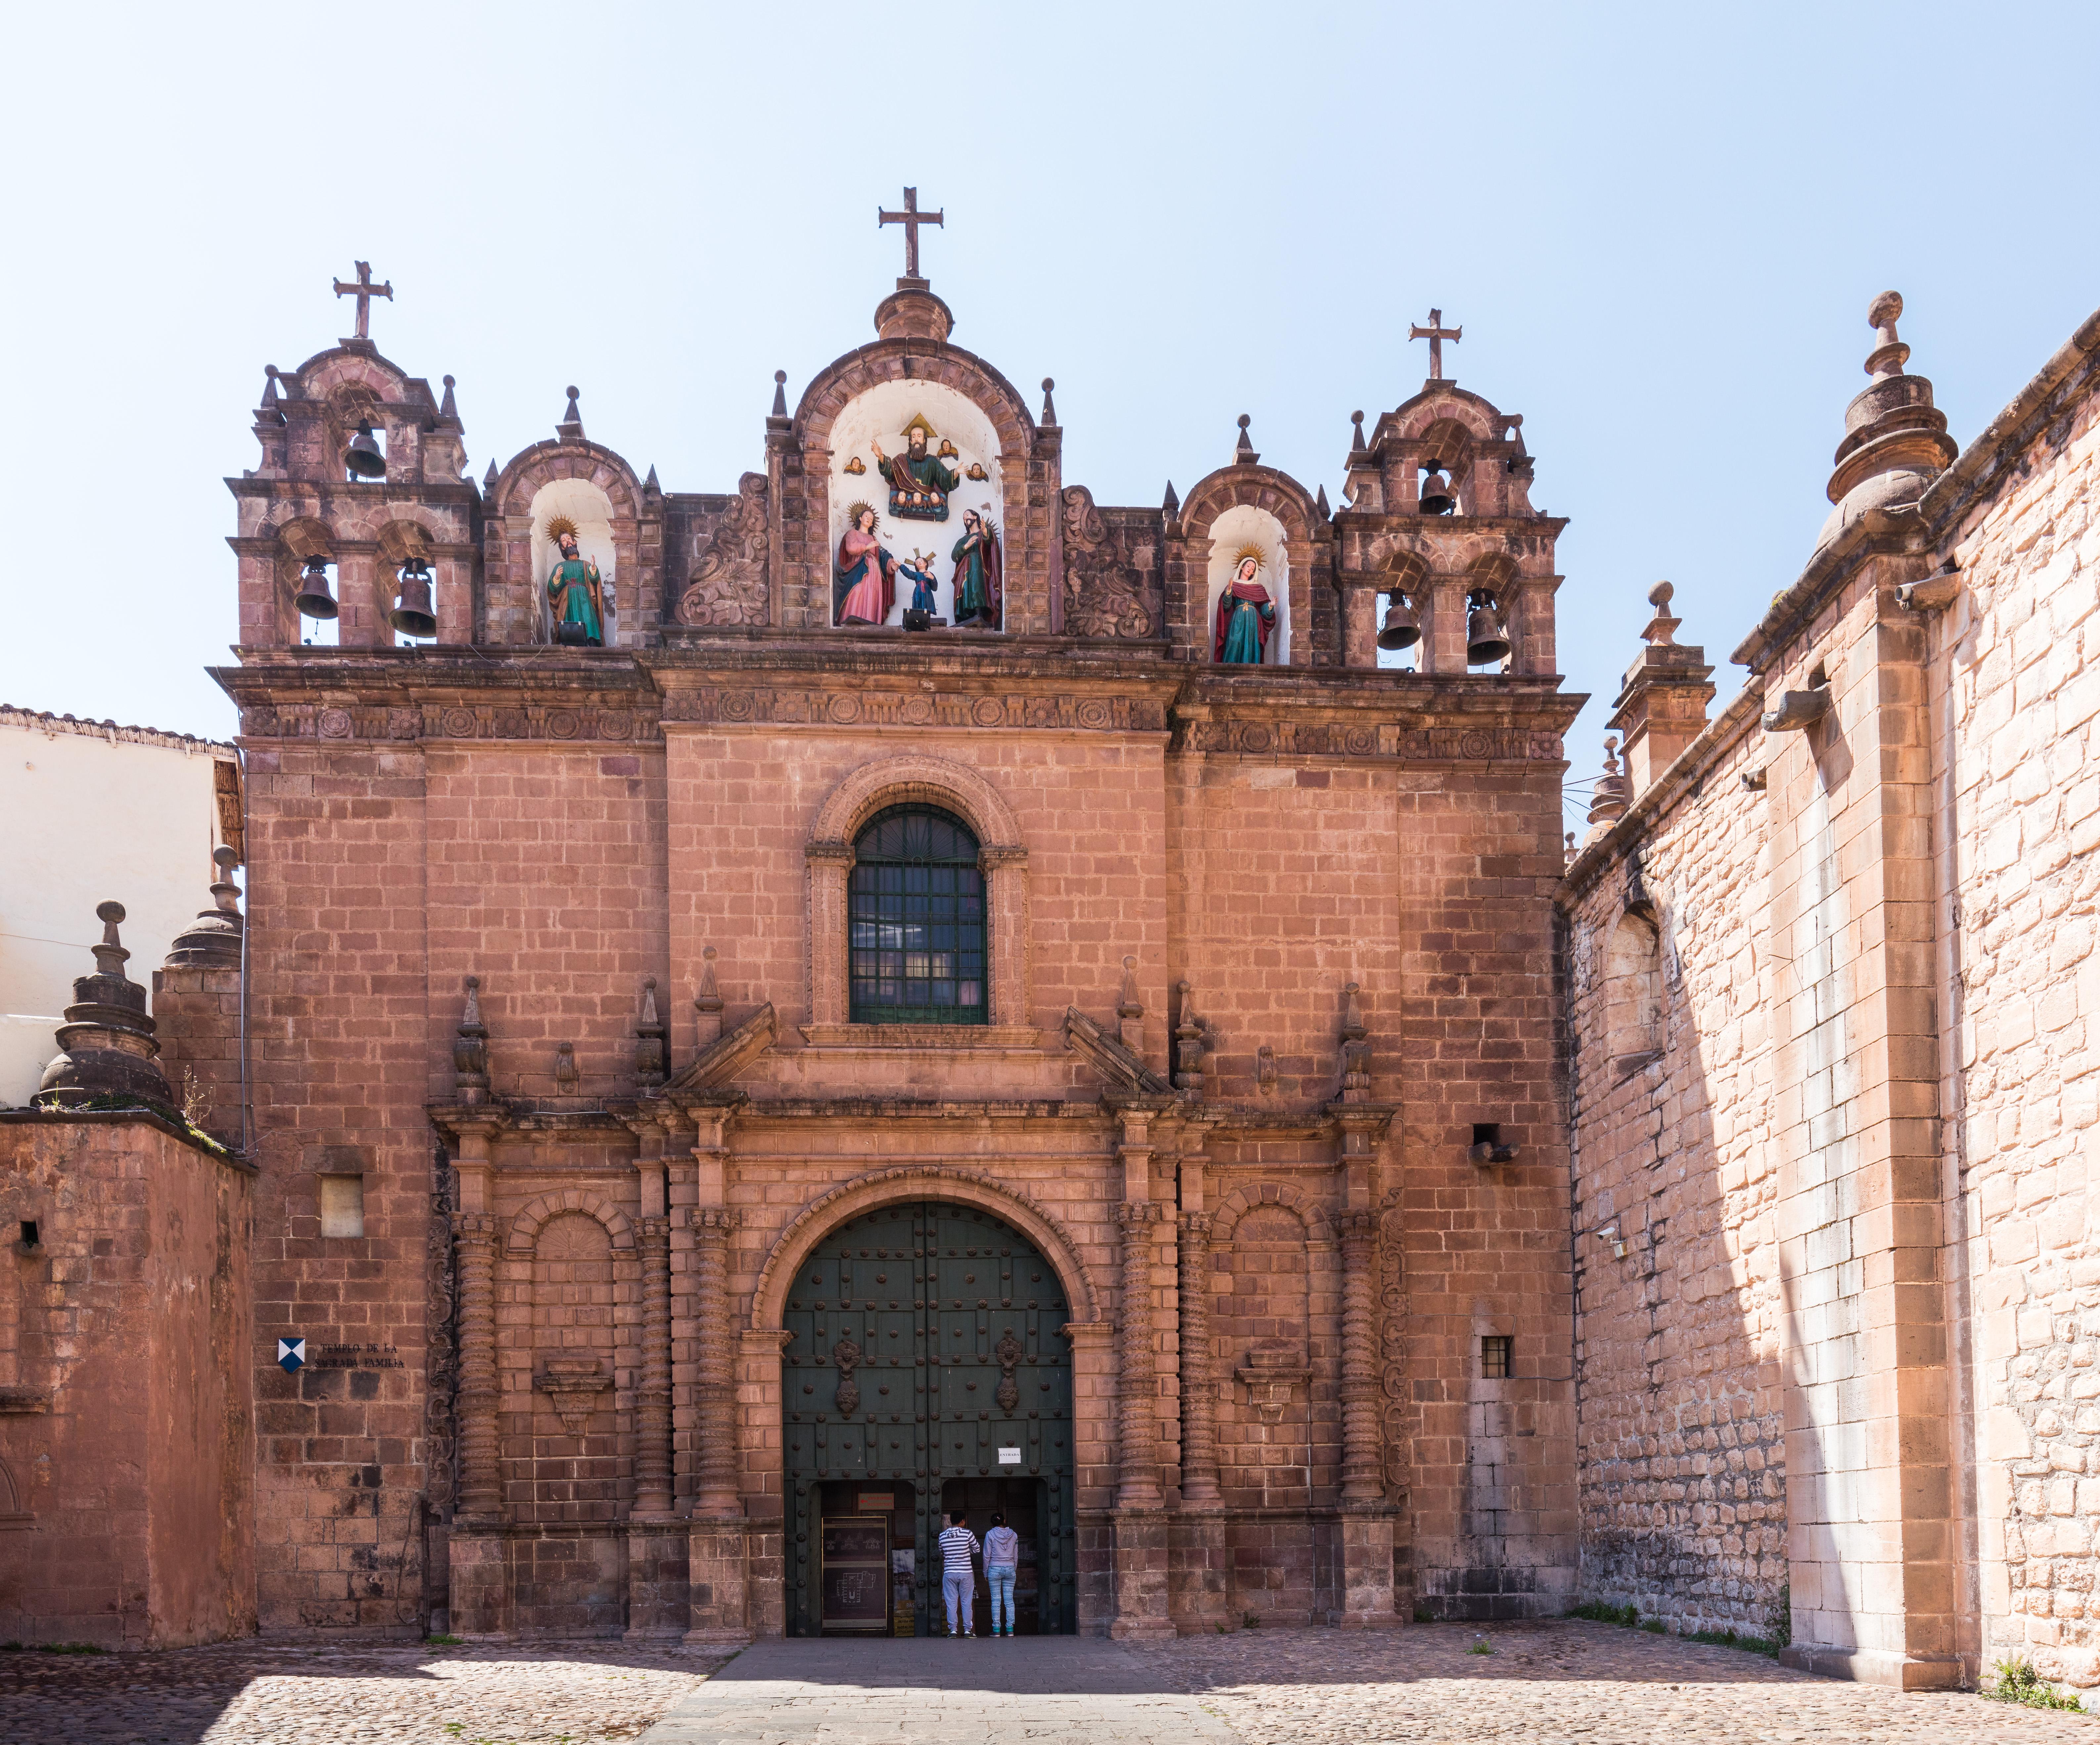 Archivo Catedral Plaza De Armas Cusco Peru 2015 07 31 Dd 57 Jpg